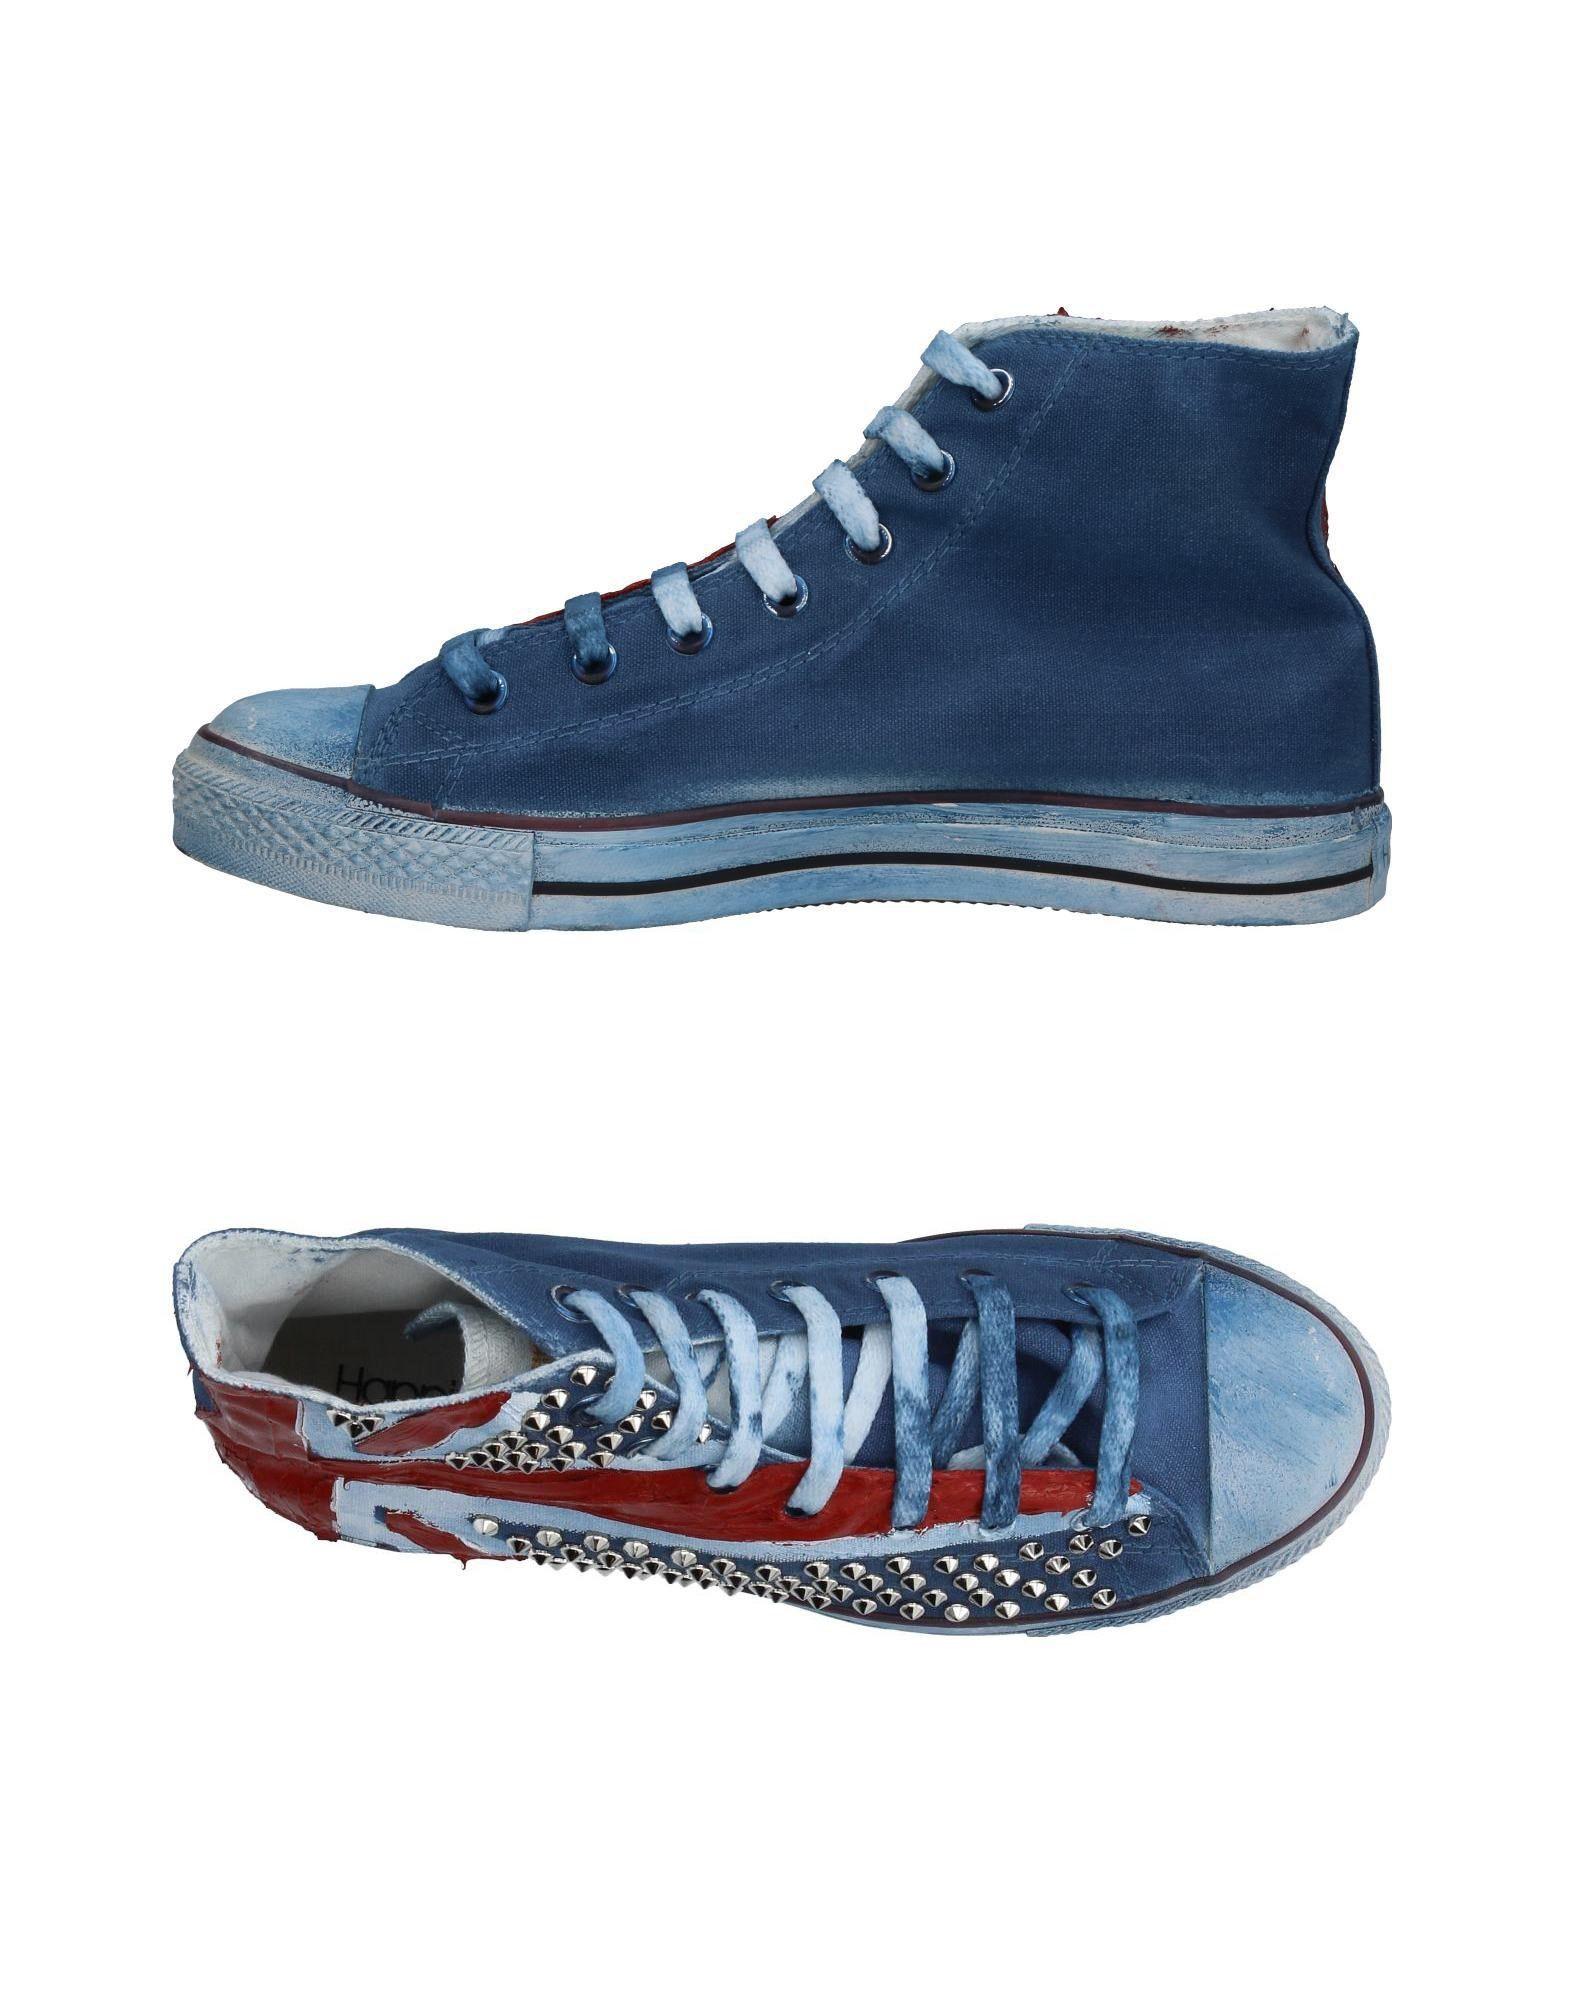 A buon mercato Sneakers Happiness Uomo - 11406029PU